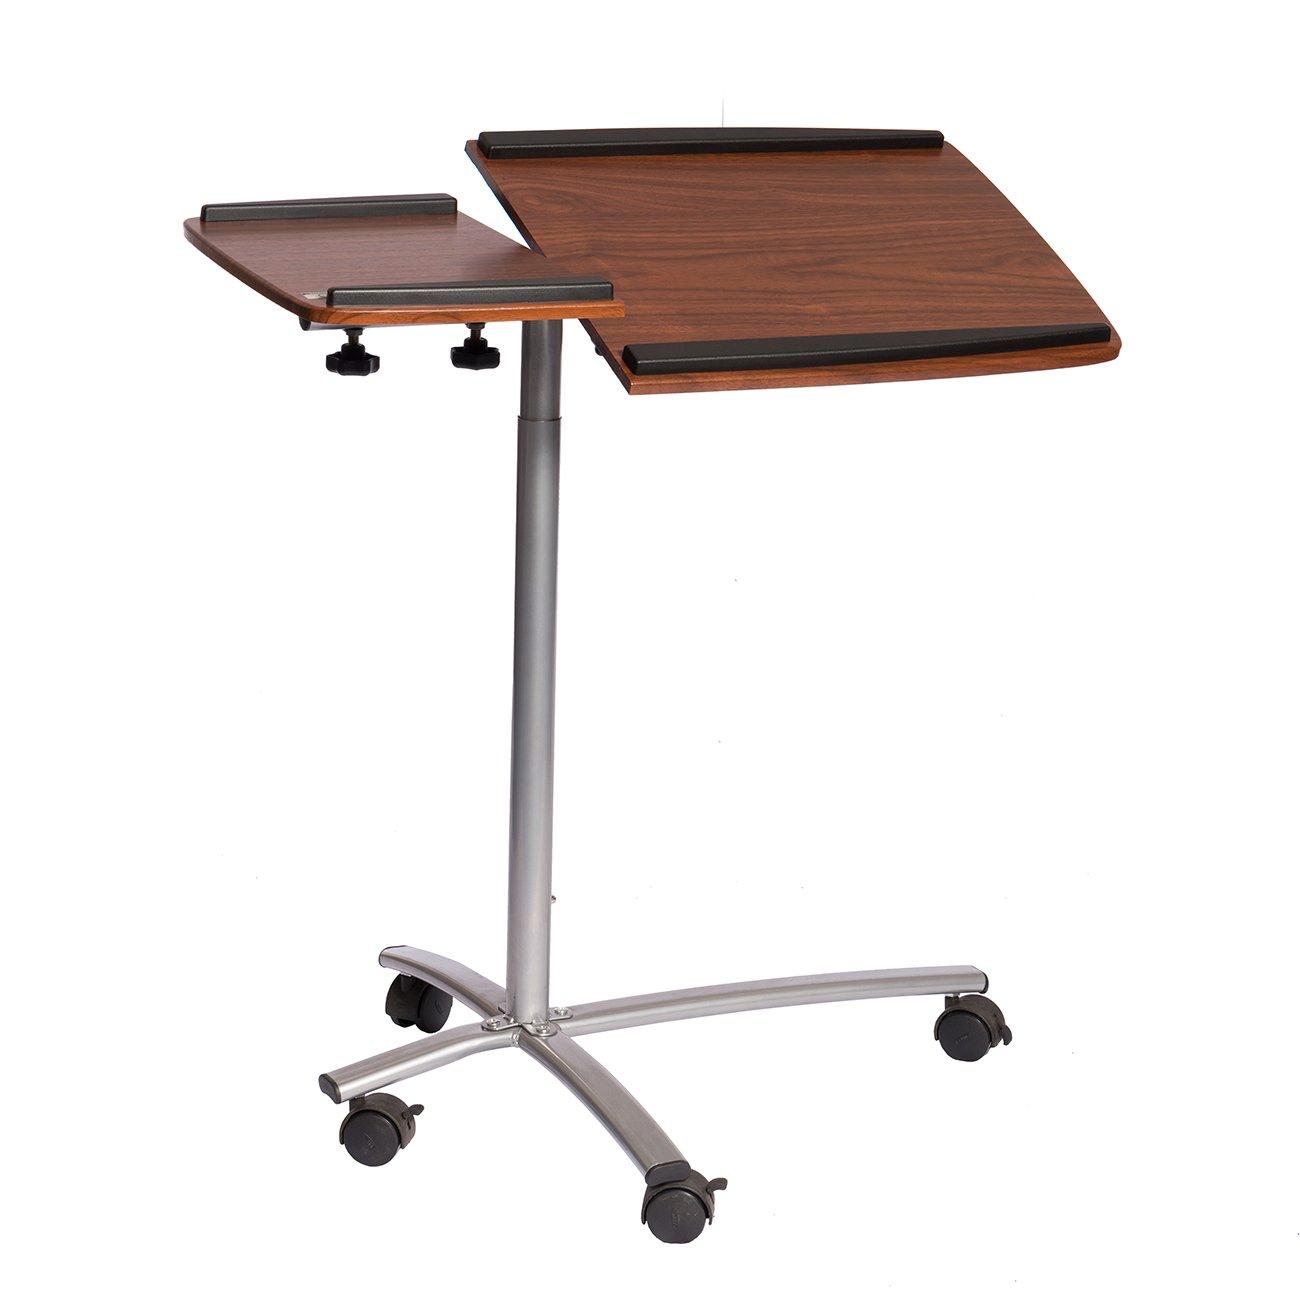 Techni Mobili RTA-B001N-M615 Sit-to-Stand Rolling Adjustable Laptop Cart, 32'' W x 18'' D x 47'' H, Mahogany